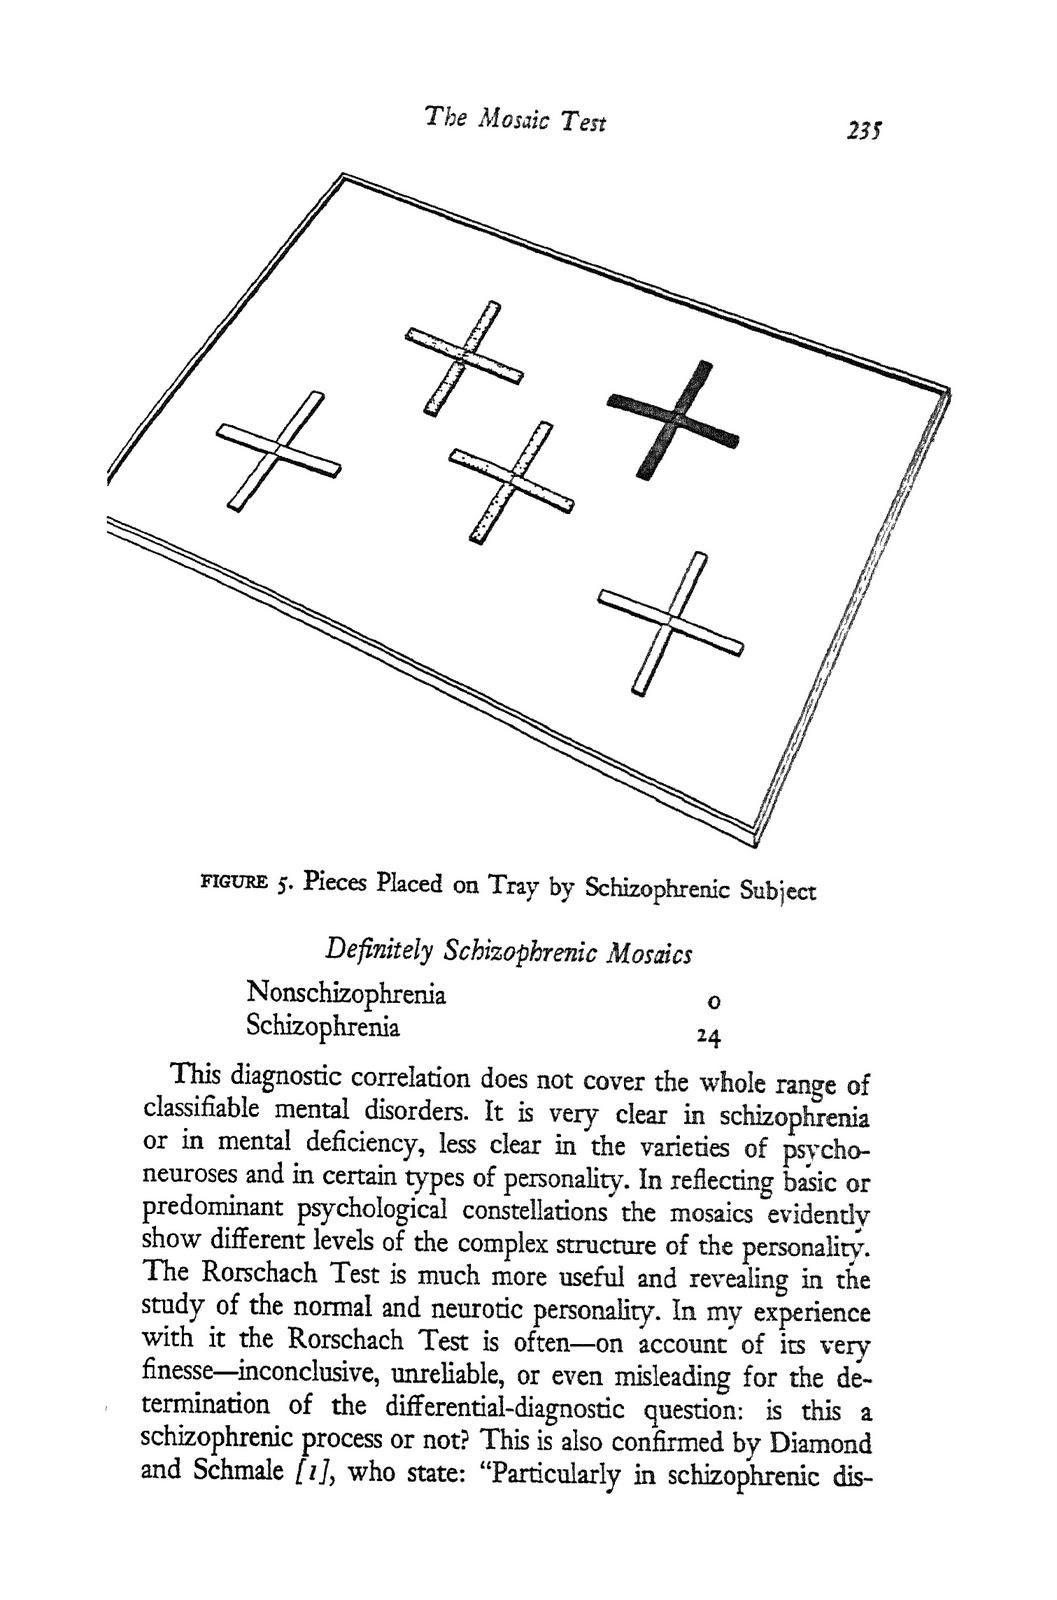 schizophrenic writing samples images schizophrenic